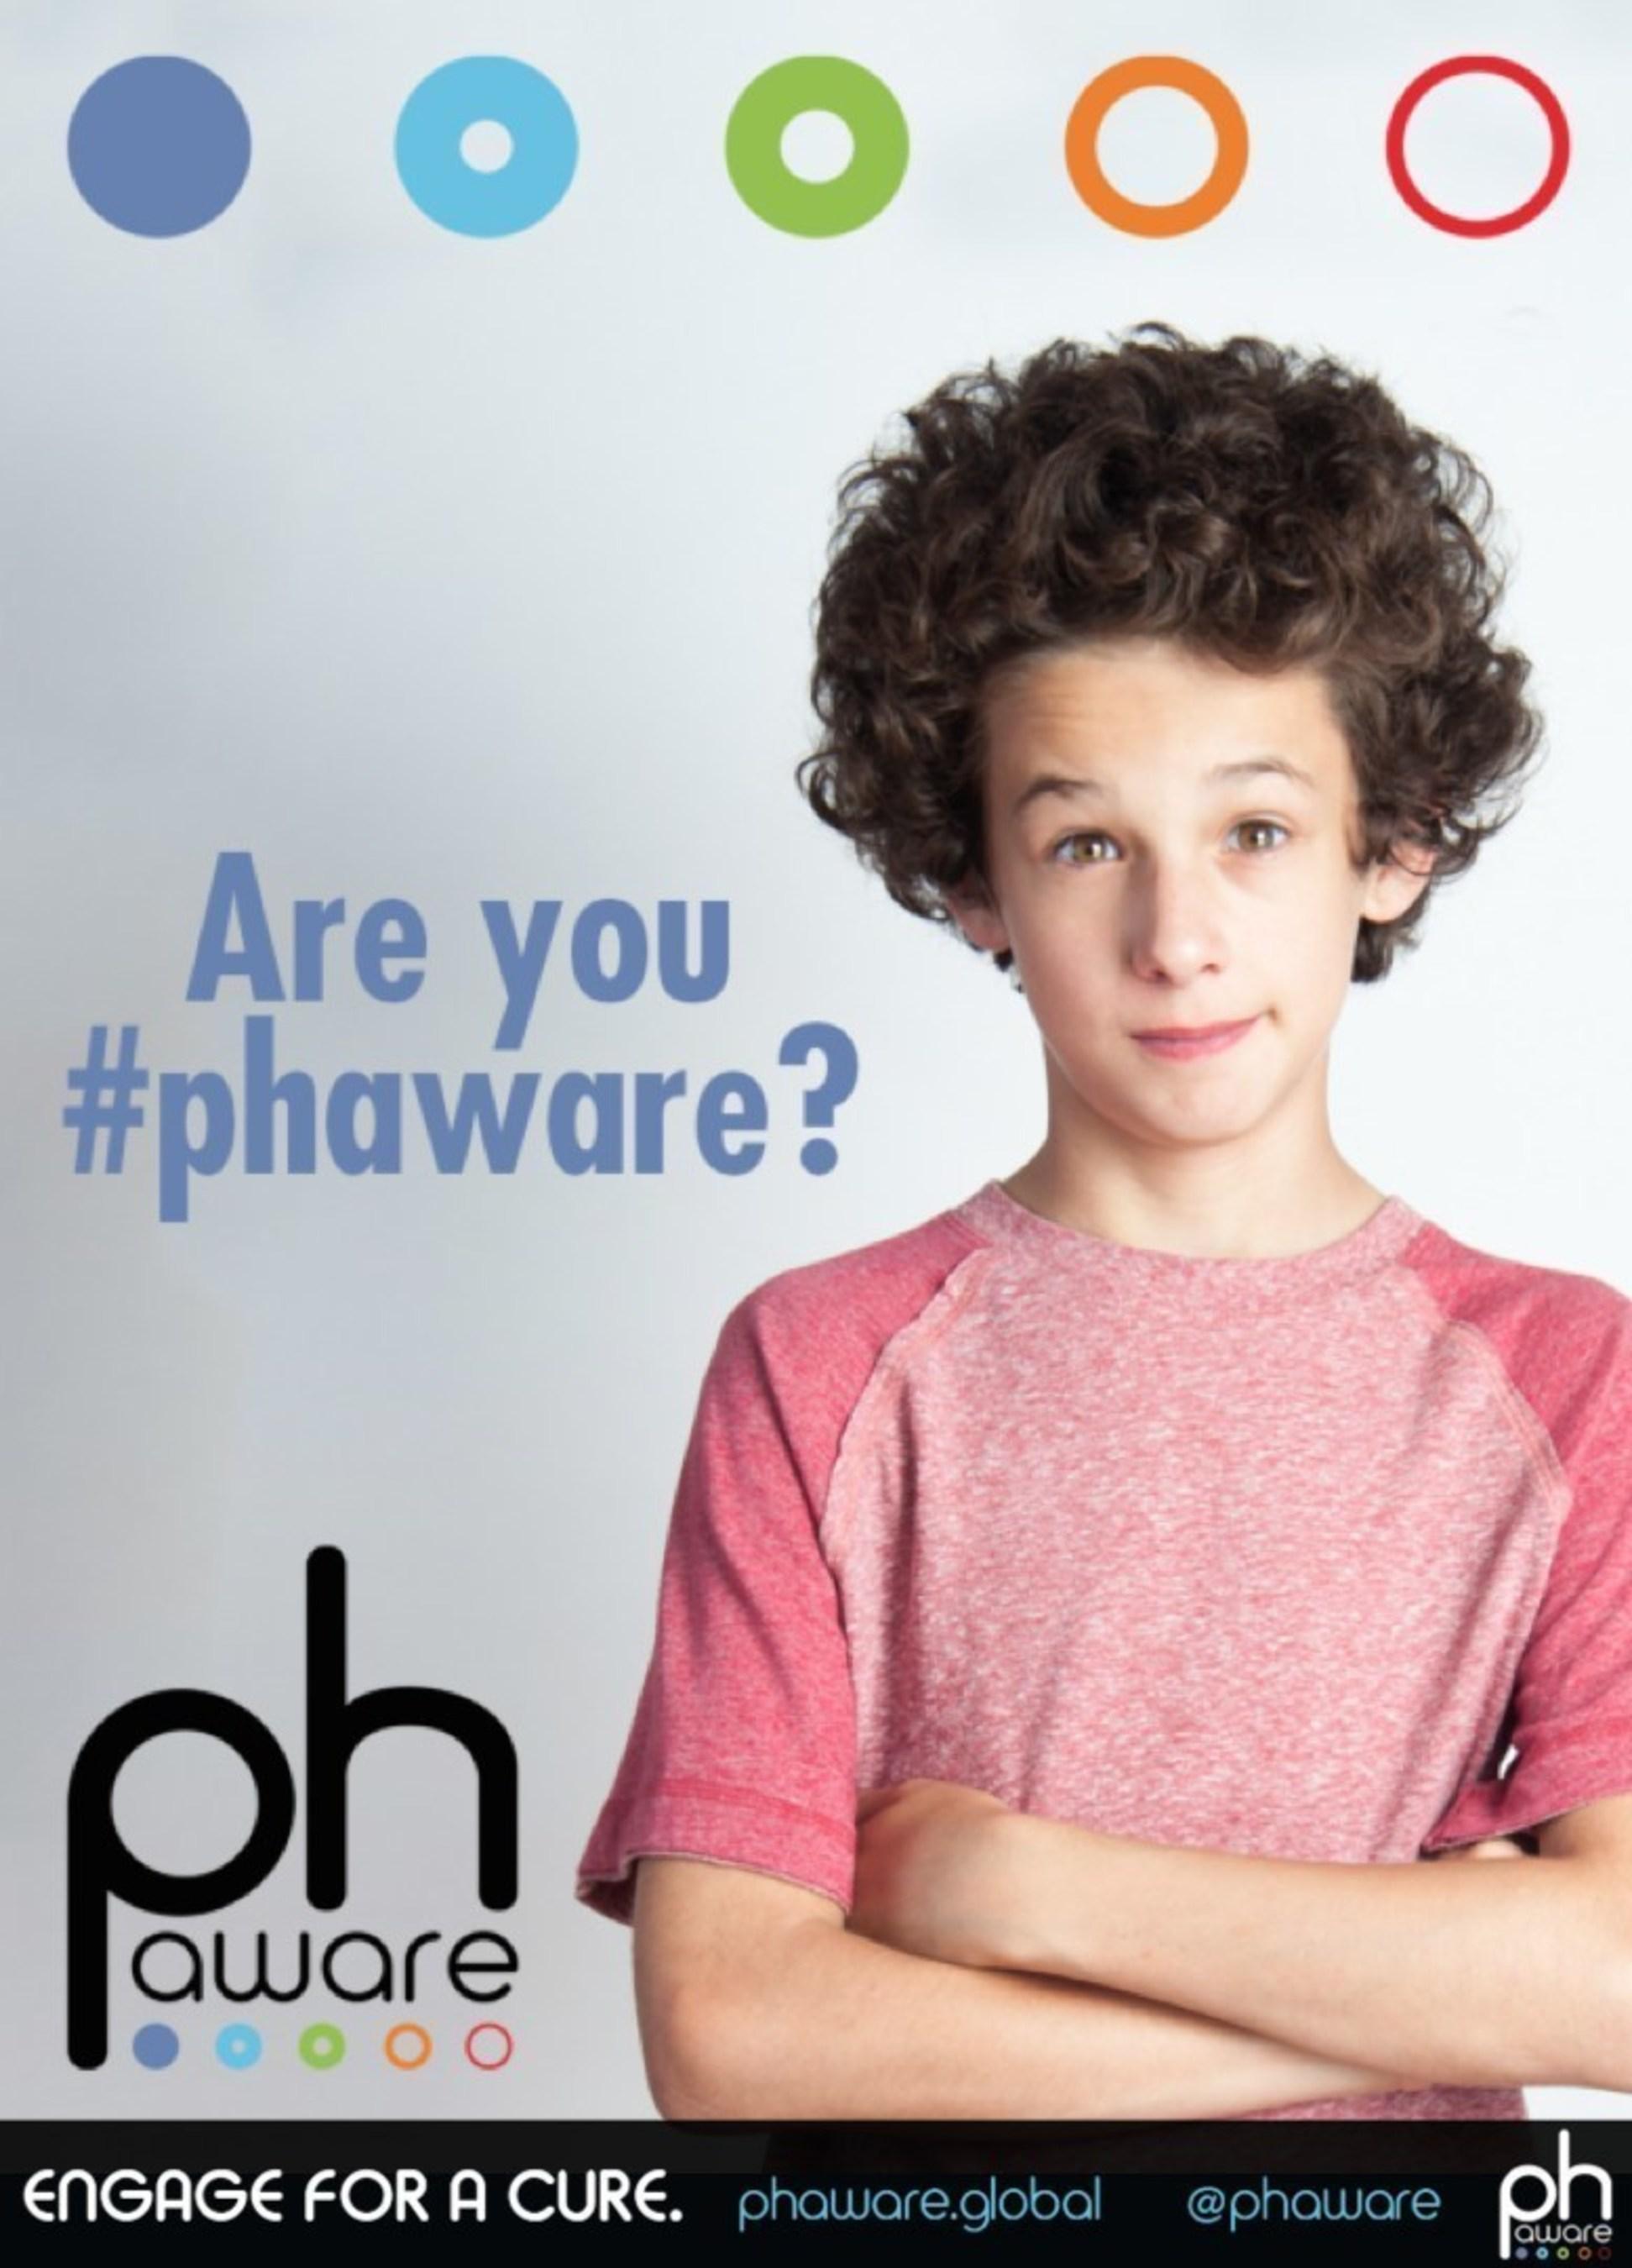 phaware365 Mobile App Takes Pulmonary Hypertension Awareness Global, Social and High Tech